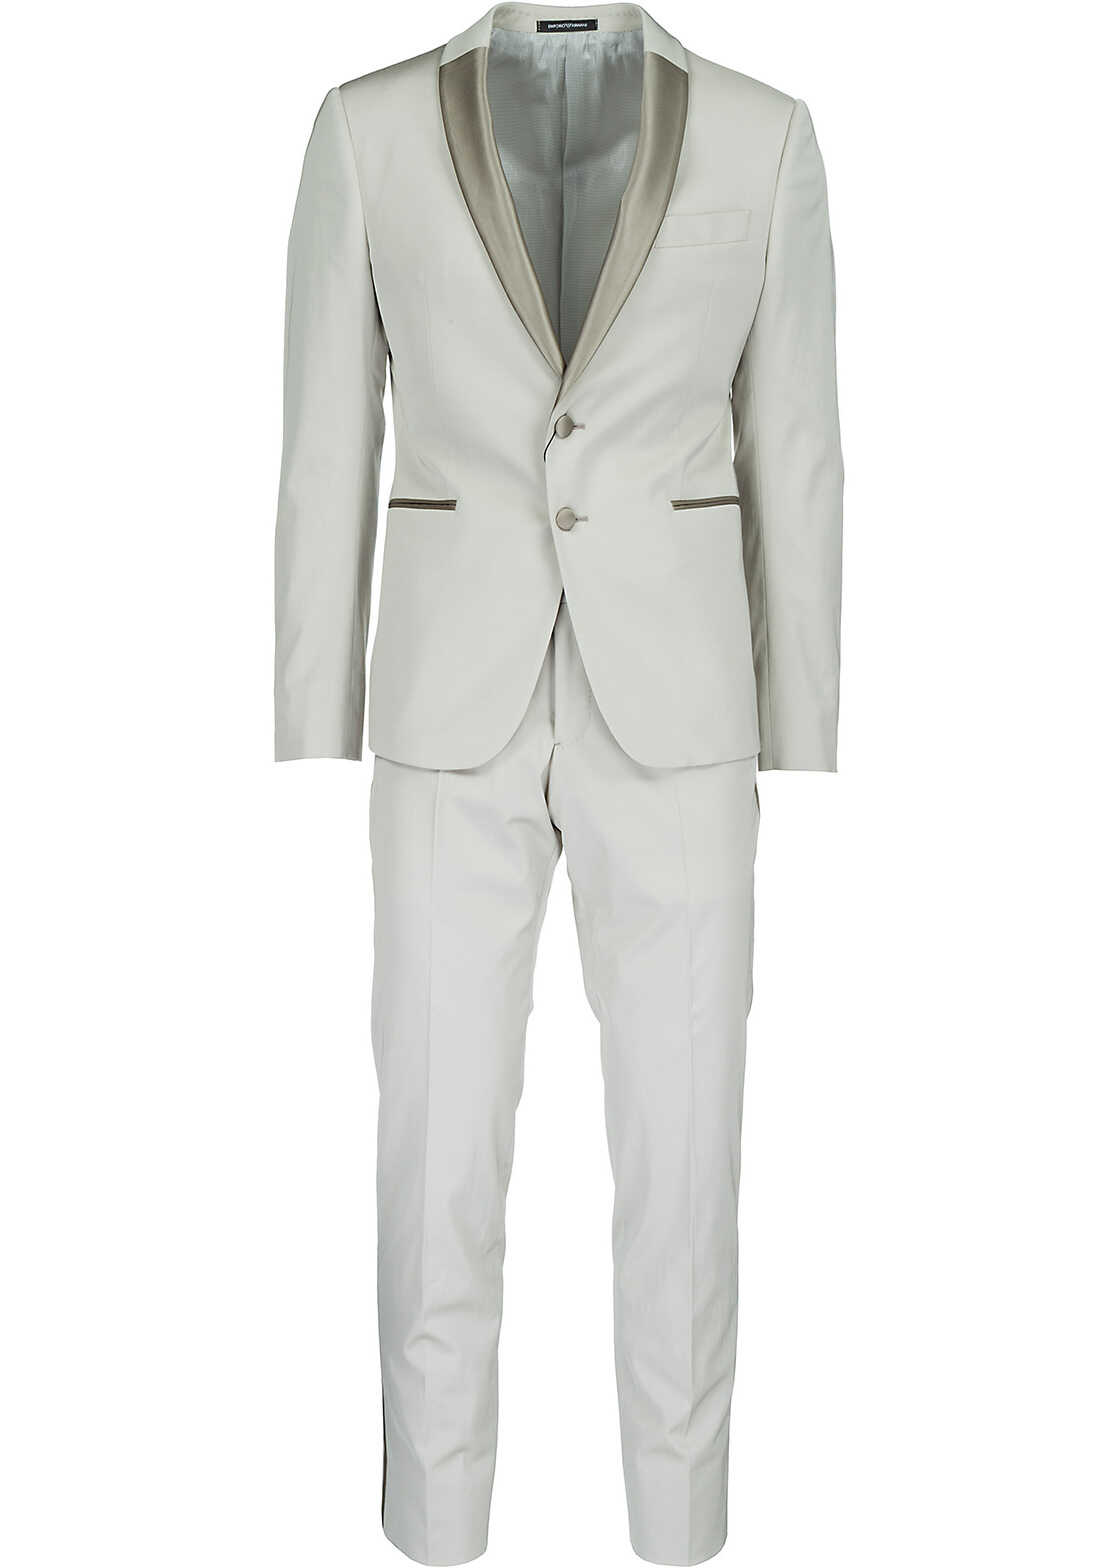 Emporio Armani Smoking Tuxedo Grey